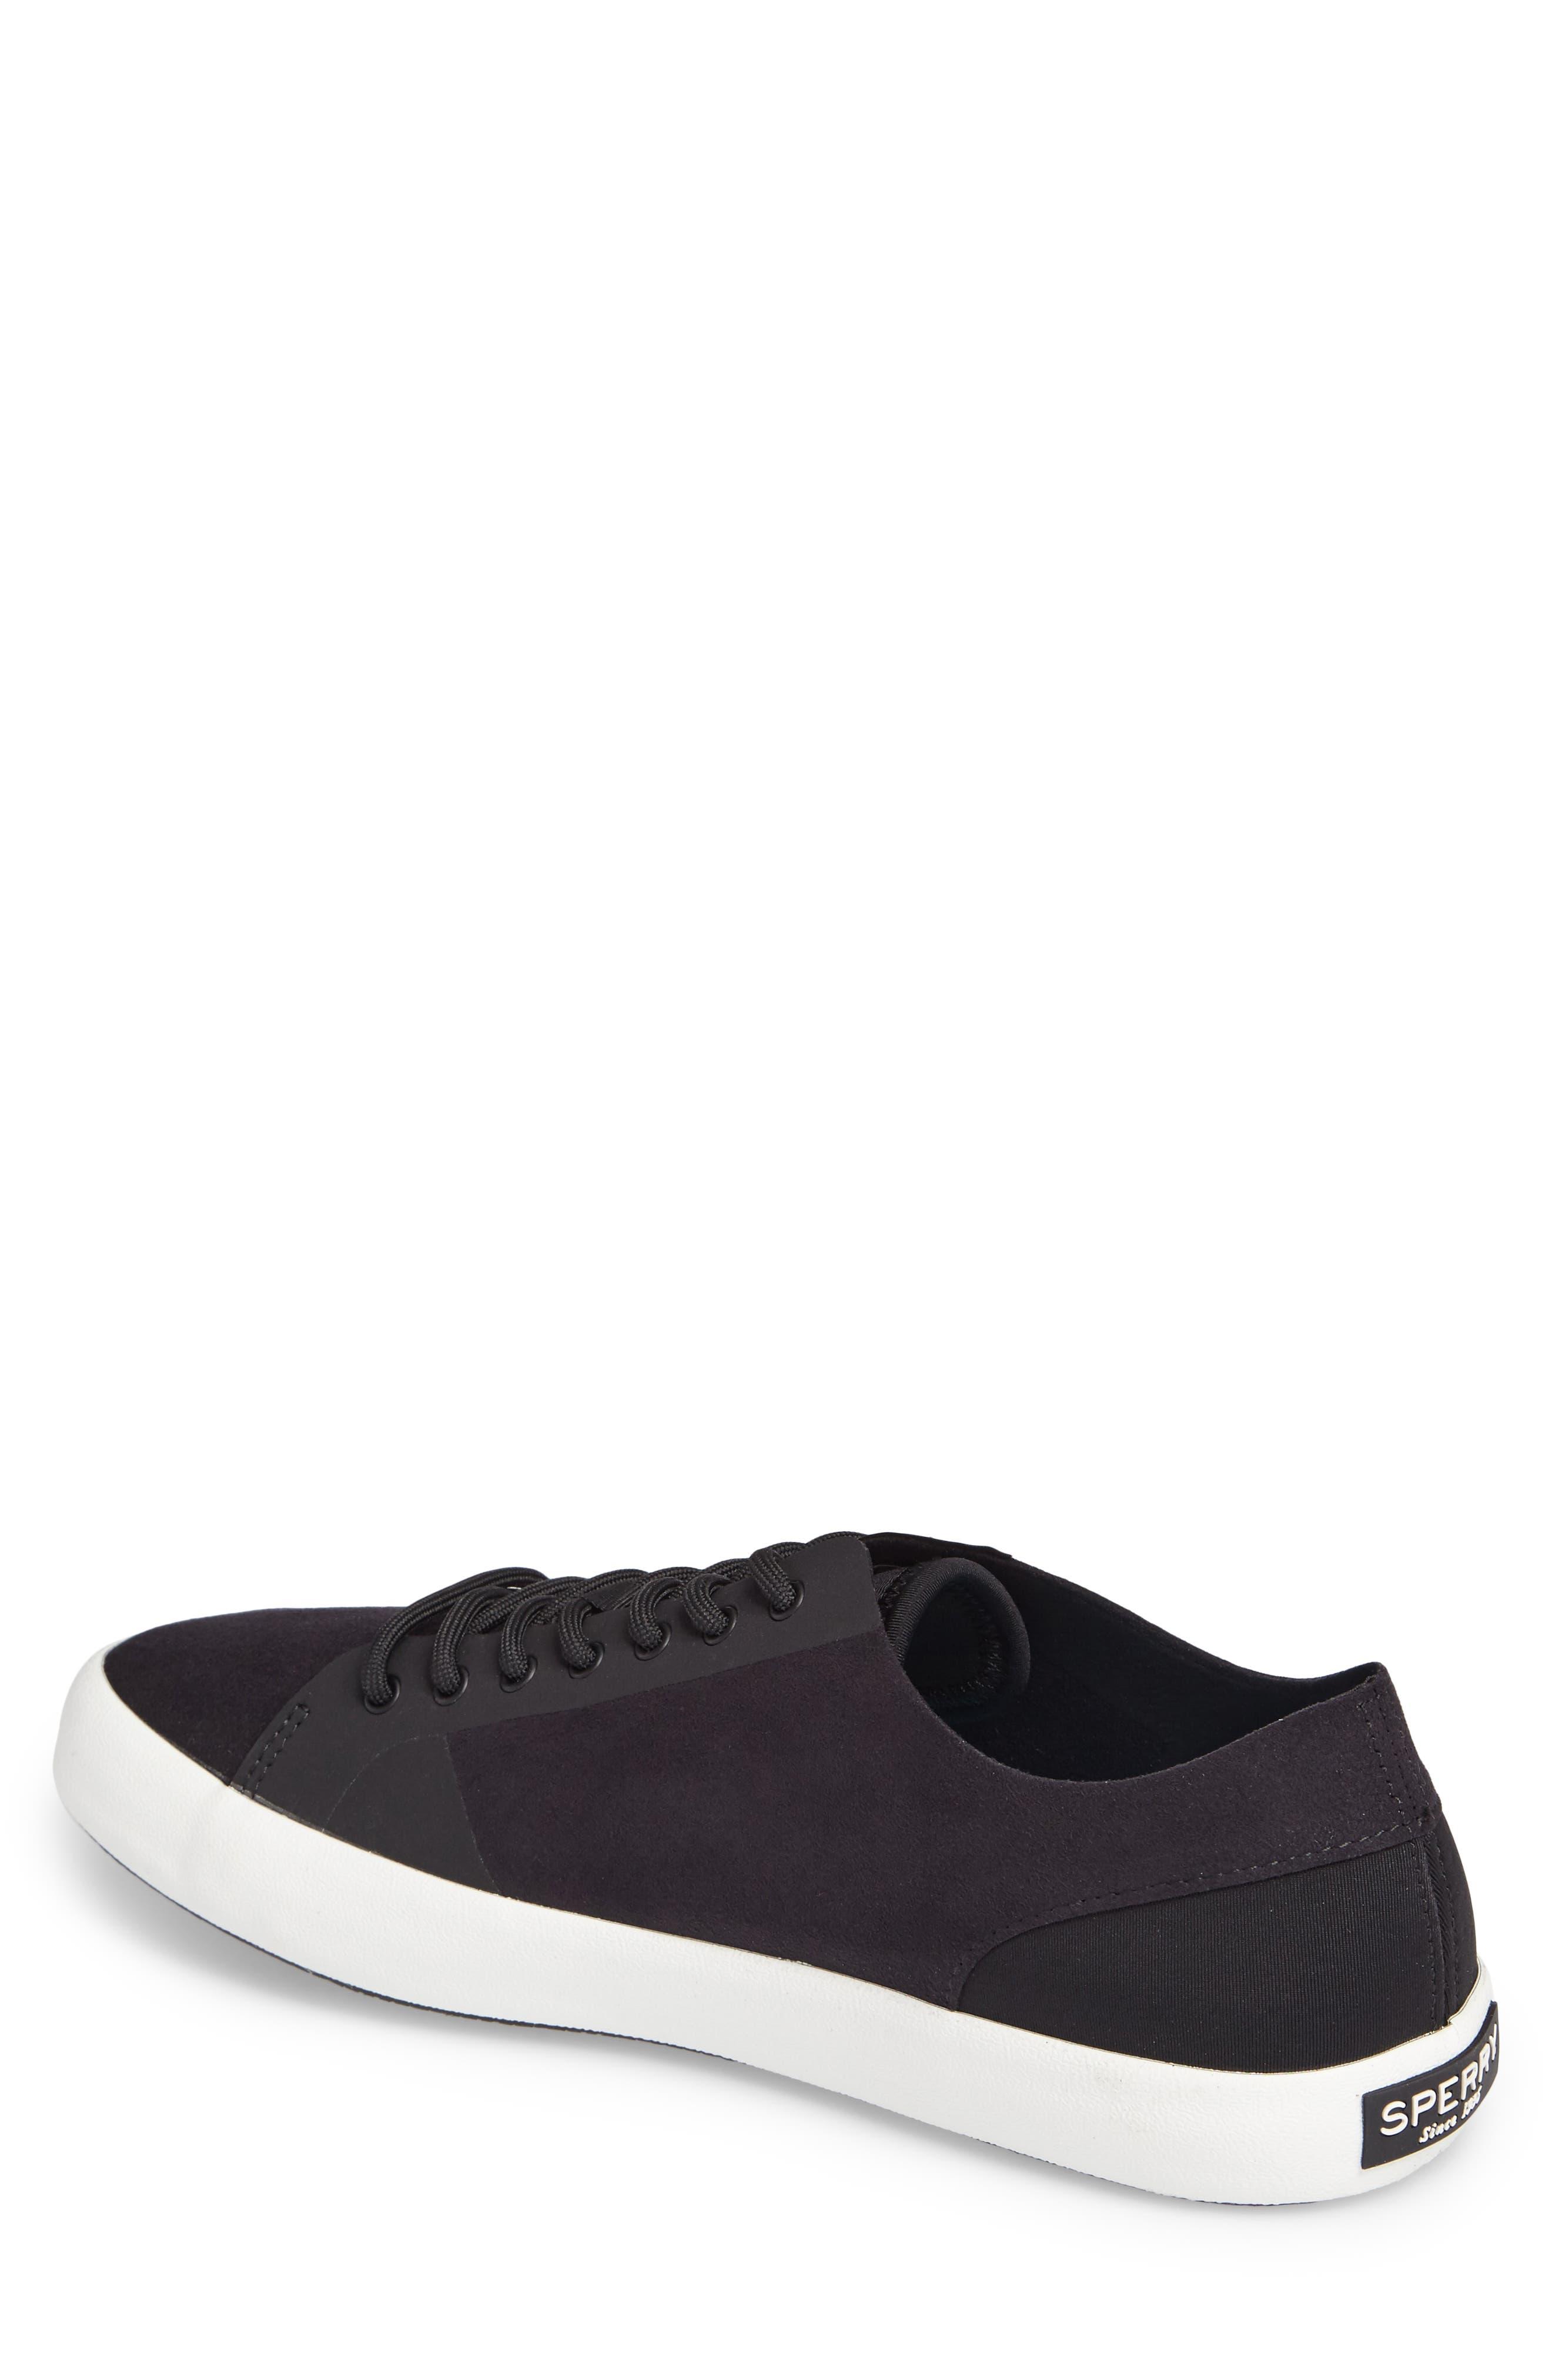 Alternate Image 2  - Sperry Flex Deck LTT Sneaker (Men)